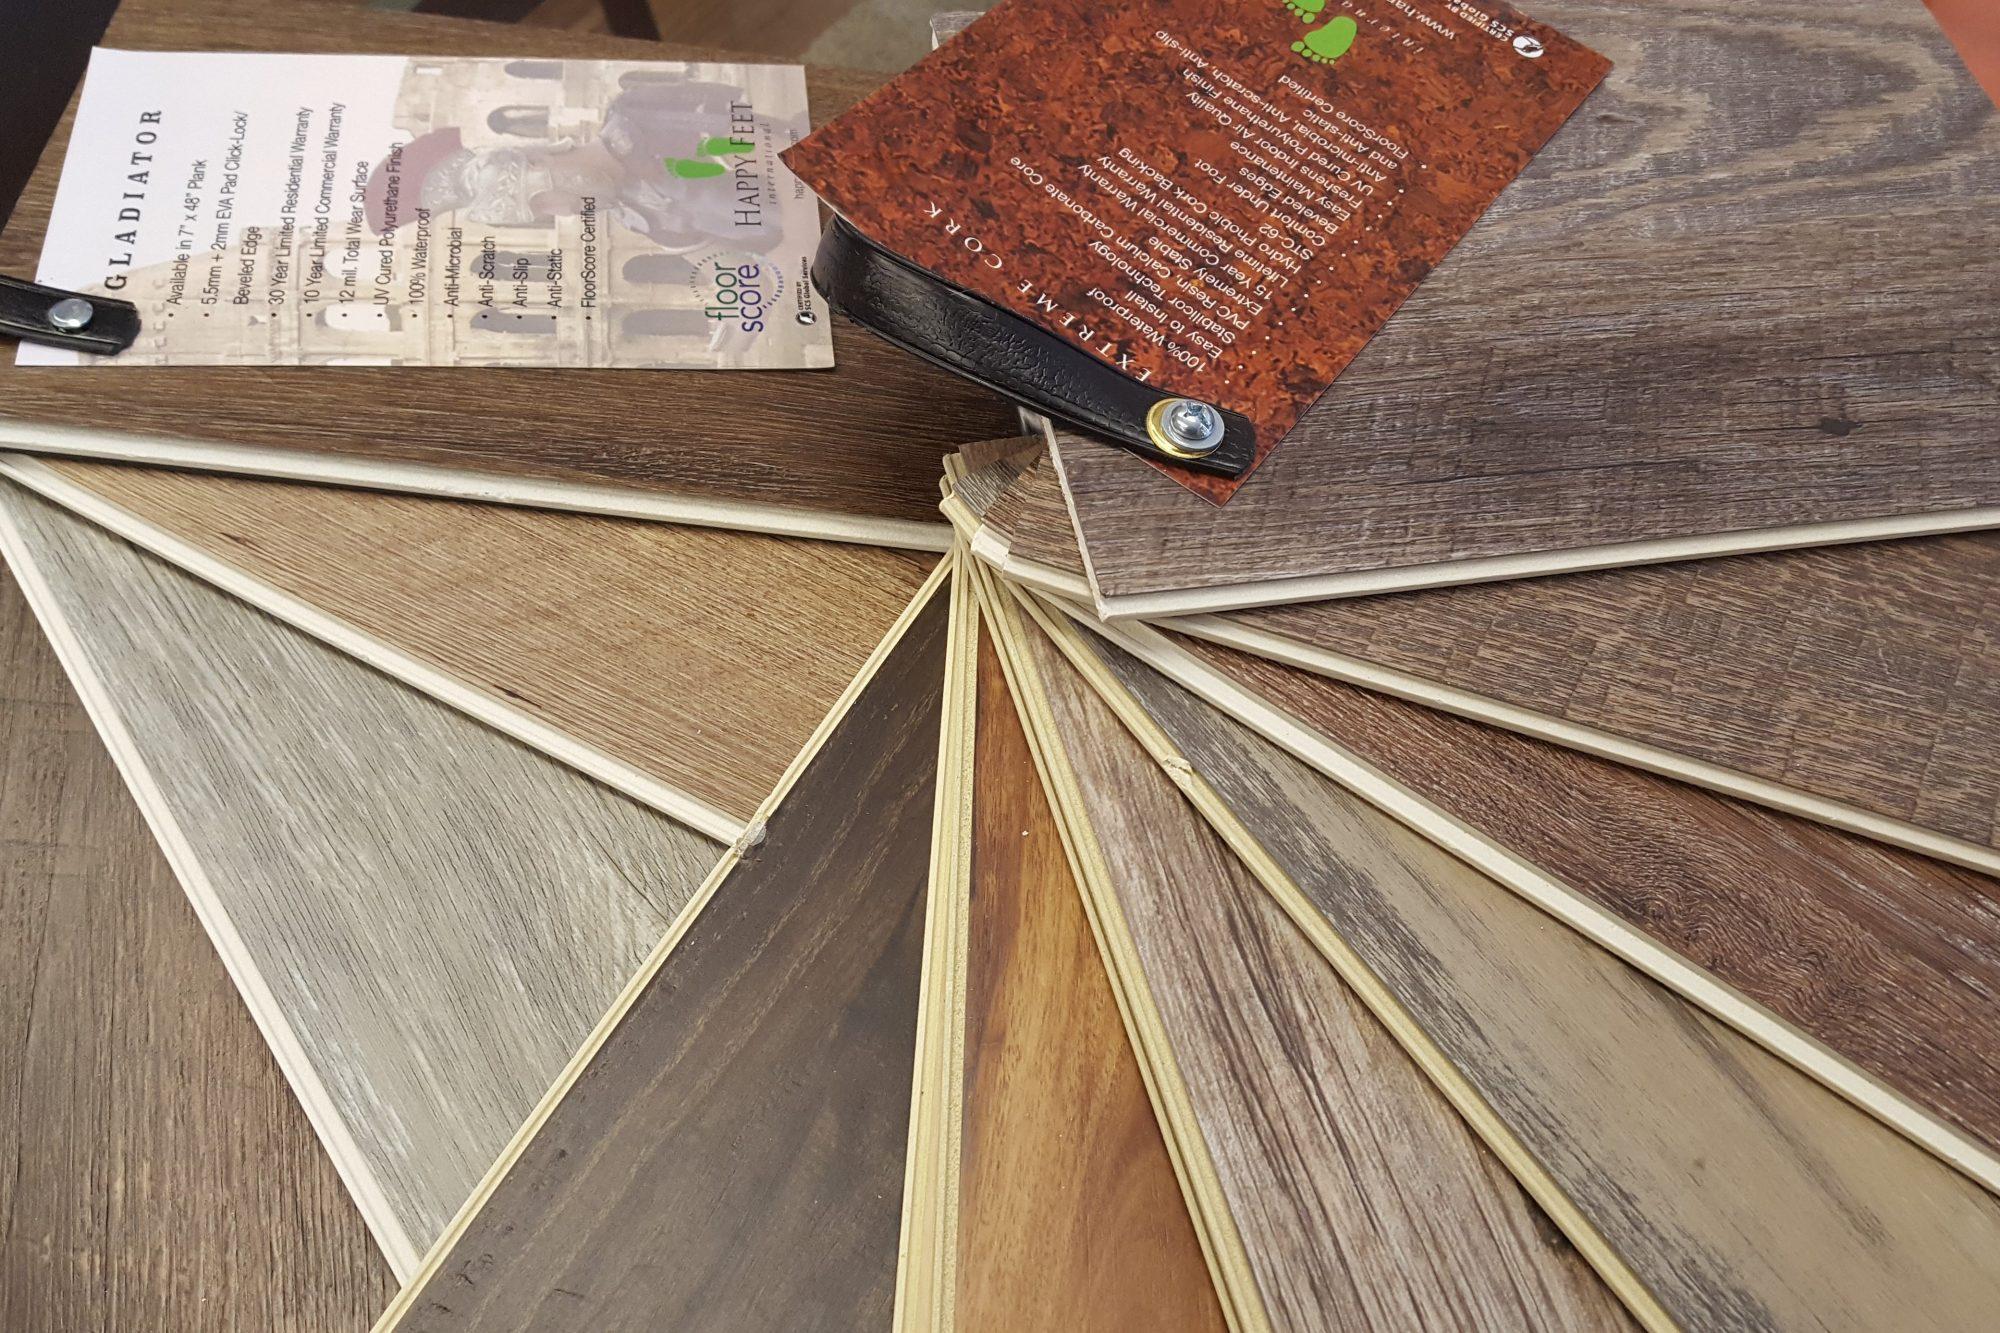 Hardwood Floors are Top Choice